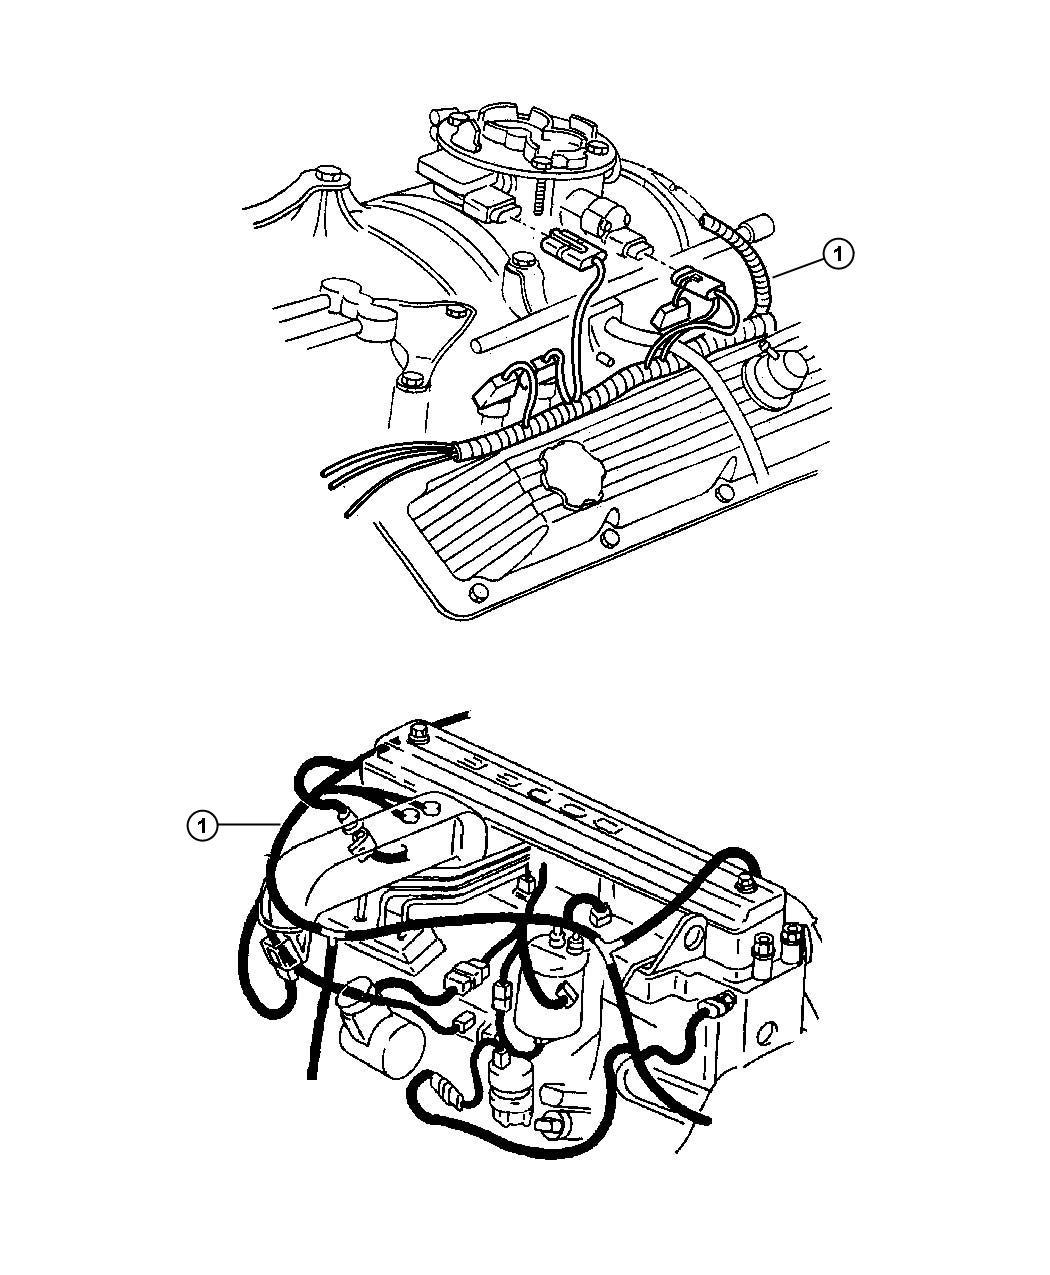 2001 dodge ram 3500 wiring  engine  california emission